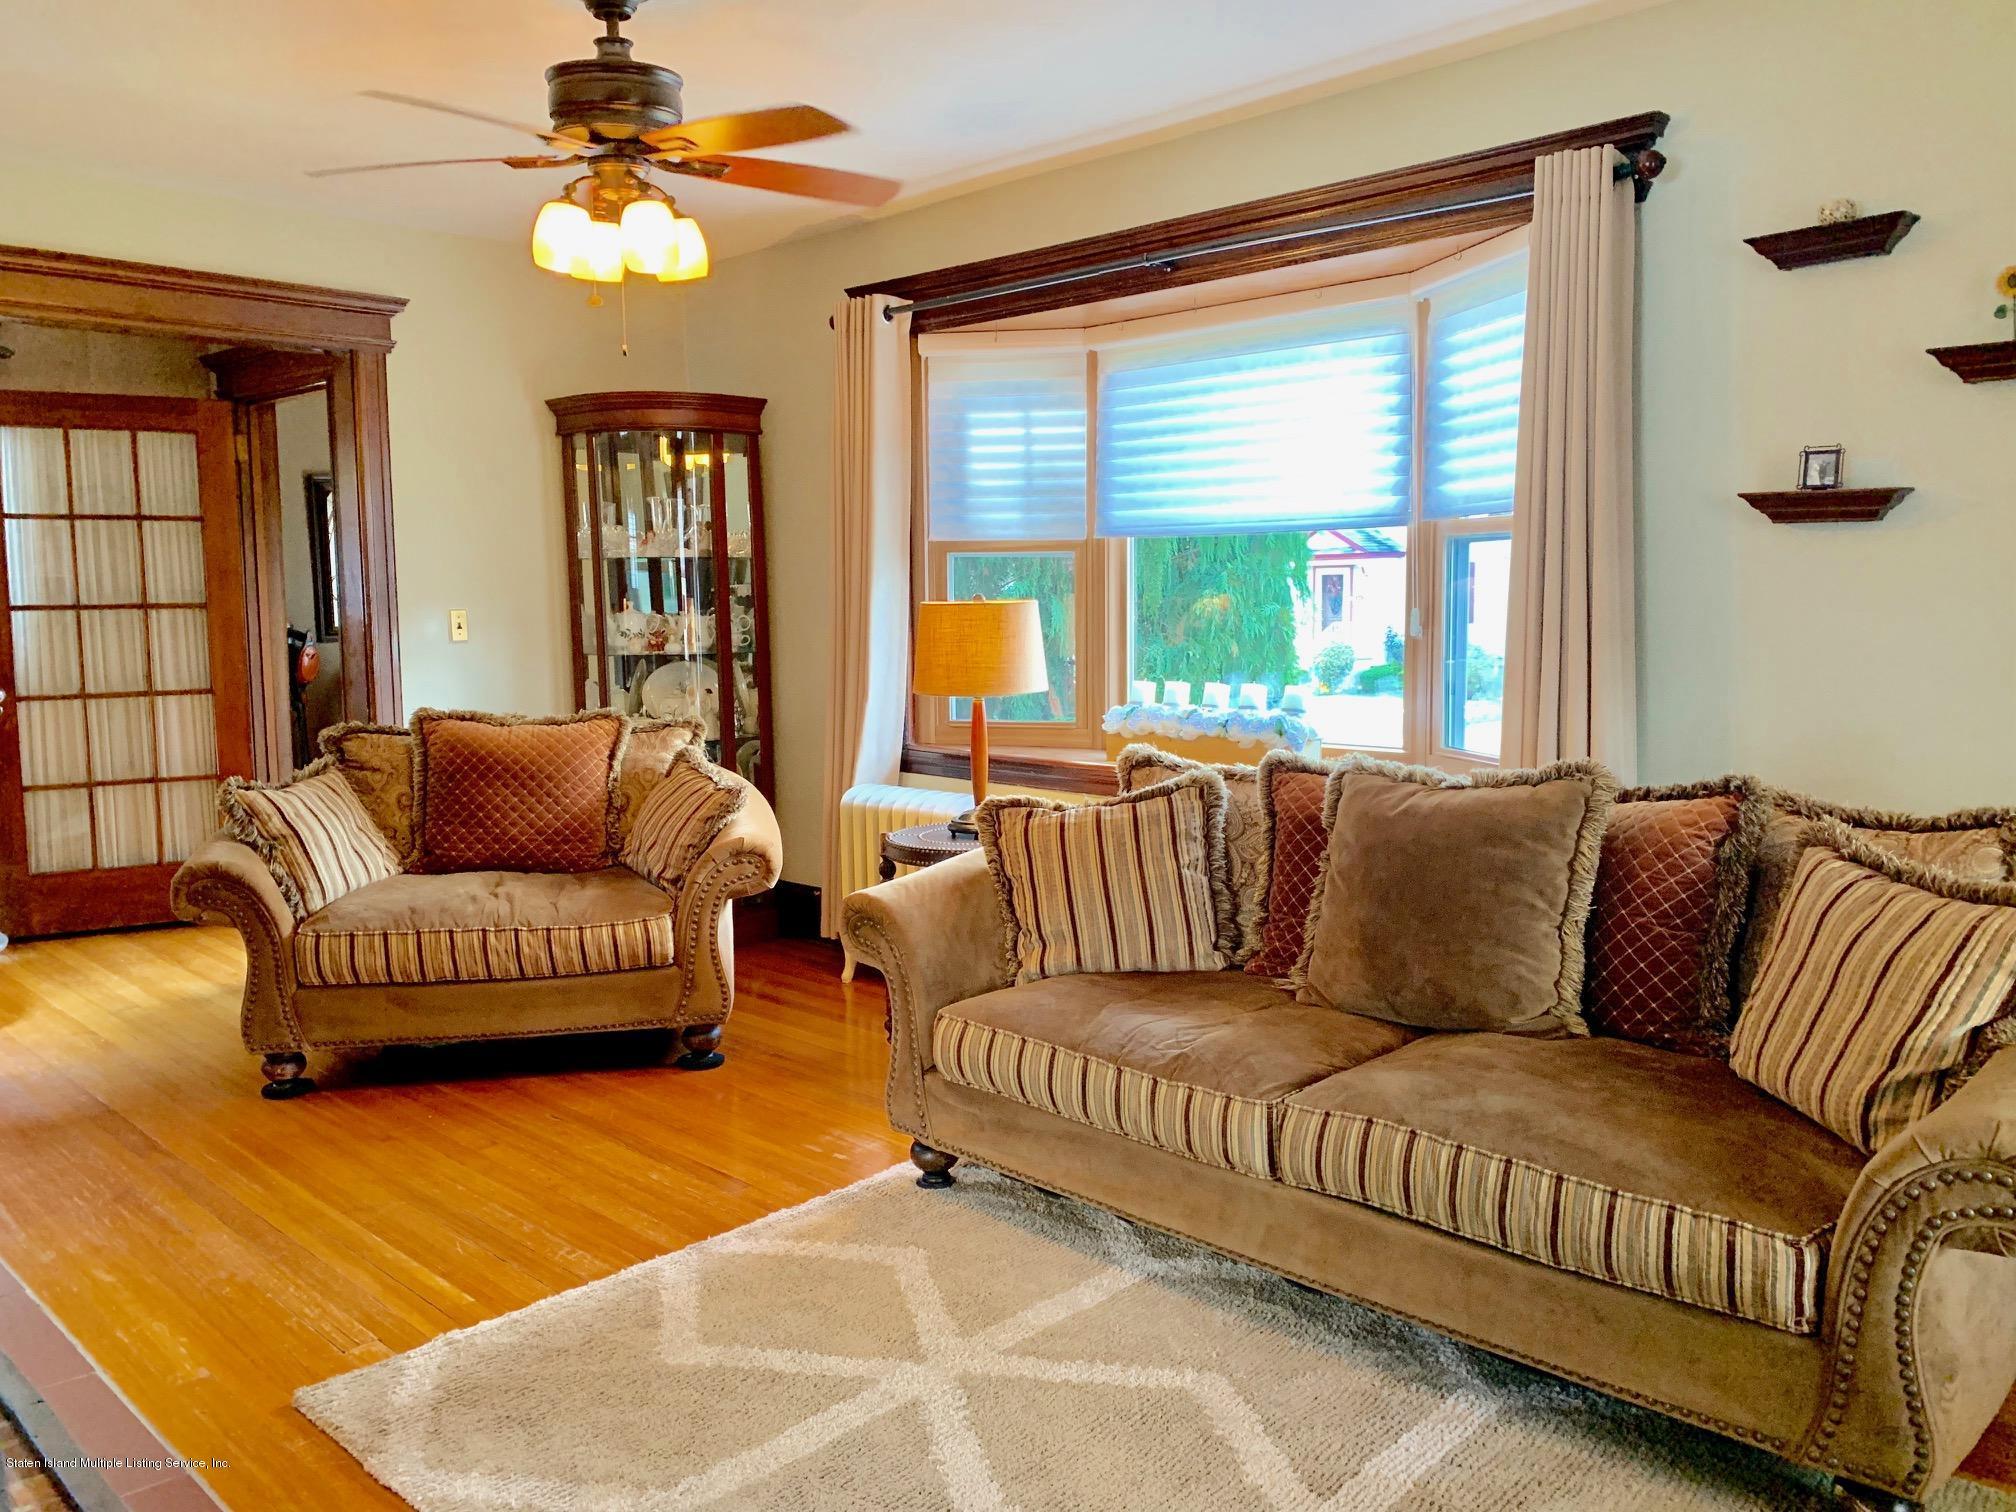 Single Family - Detached 195 Fairview Avenue  Staten Island, NY 10314, MLS-1132423-8